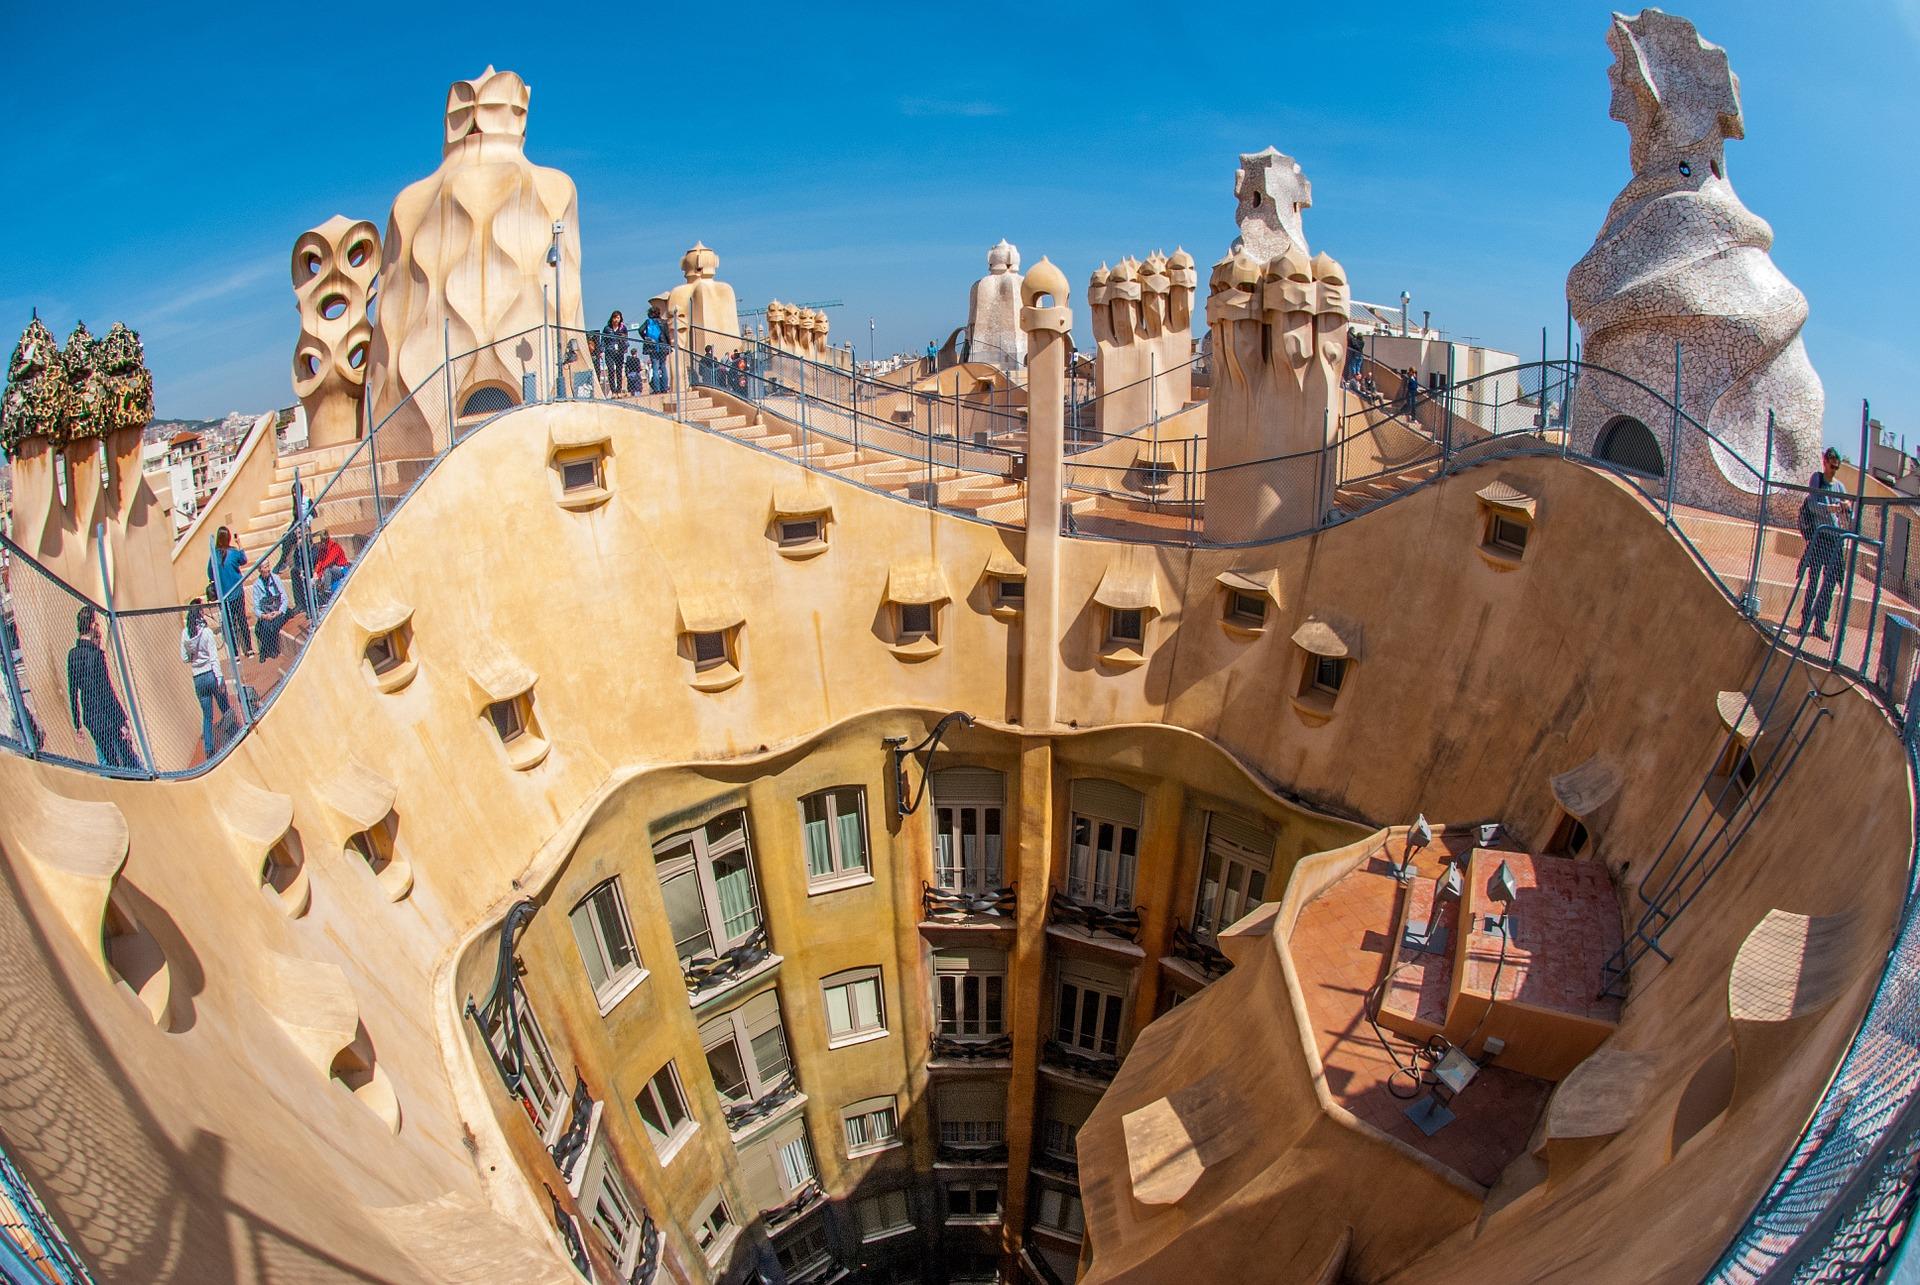 Fußball Barcelona & Sightseeing Tour